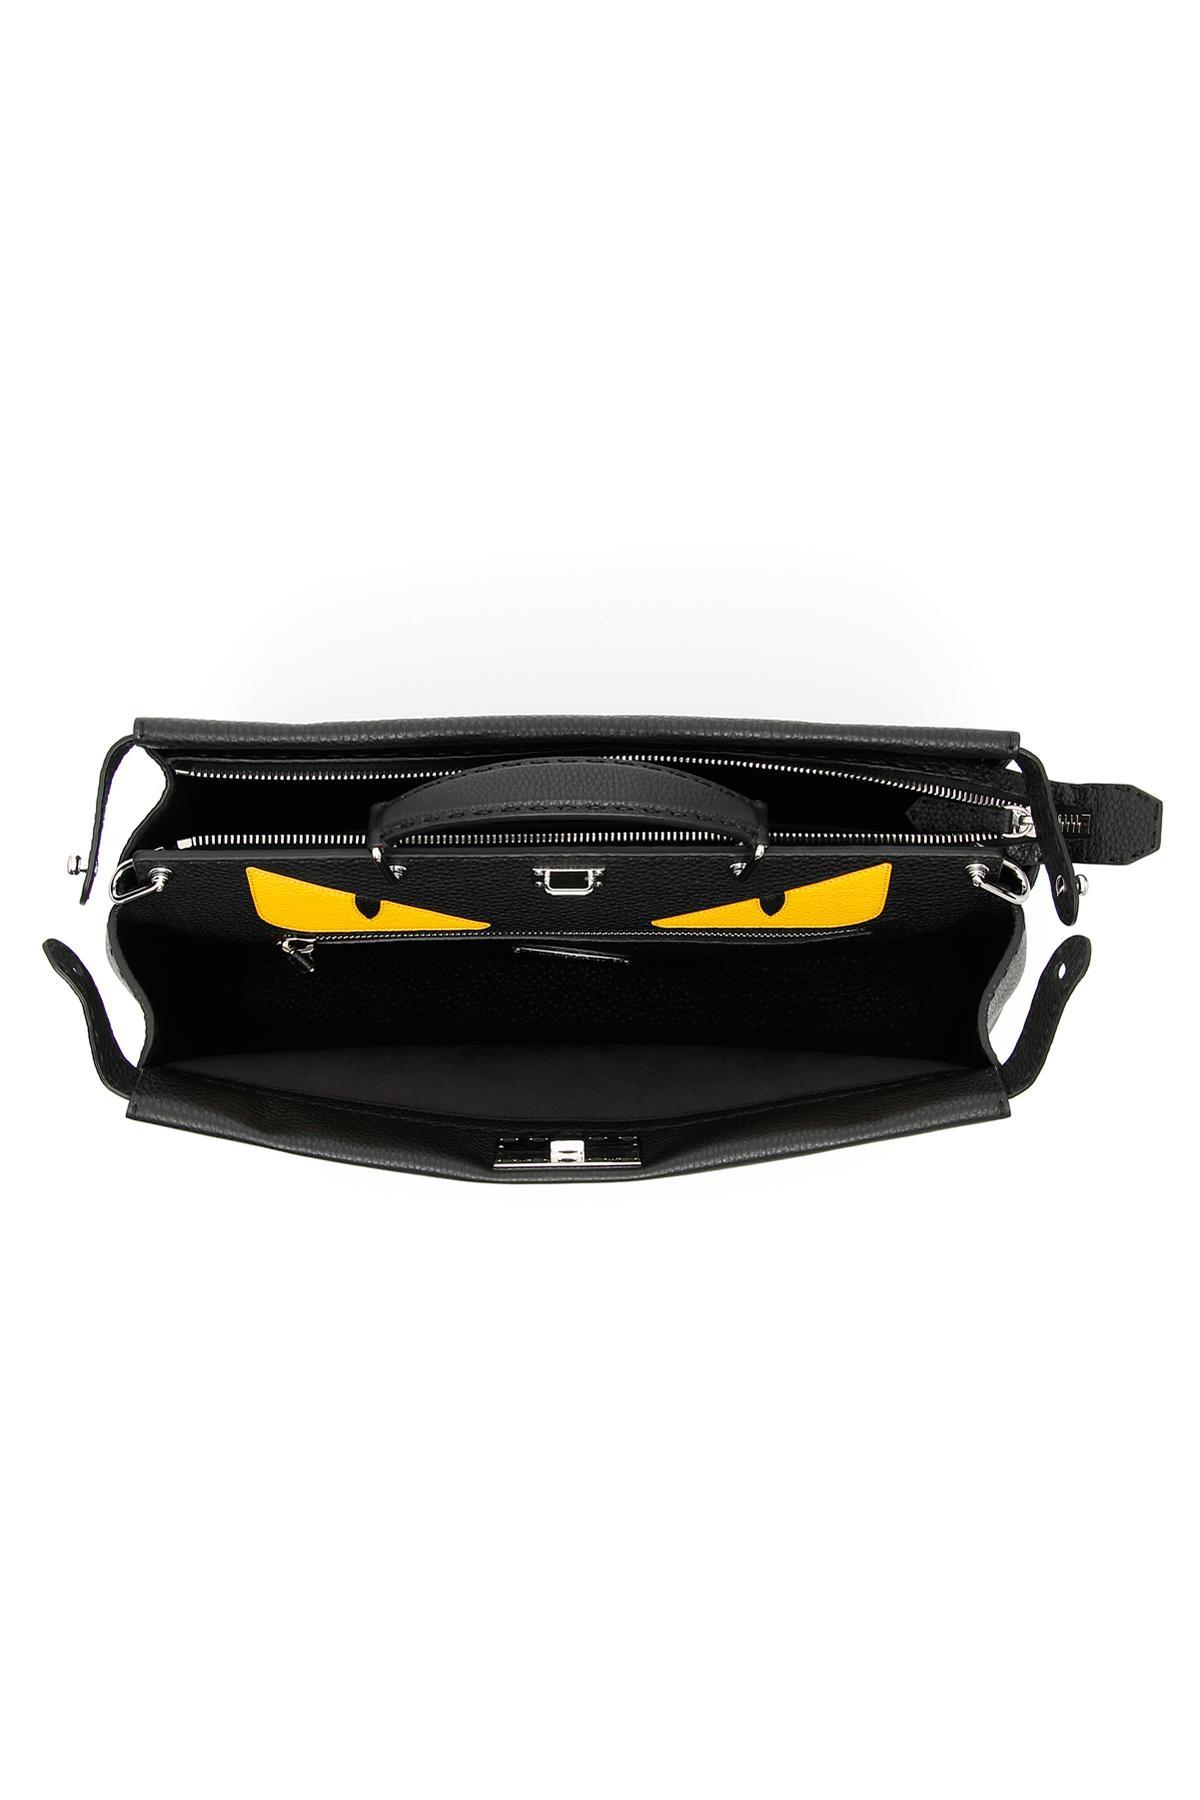 ff00662a022 Fendi Roman Leather Peekaboo Selleria Bag in Black for Men - Lyst